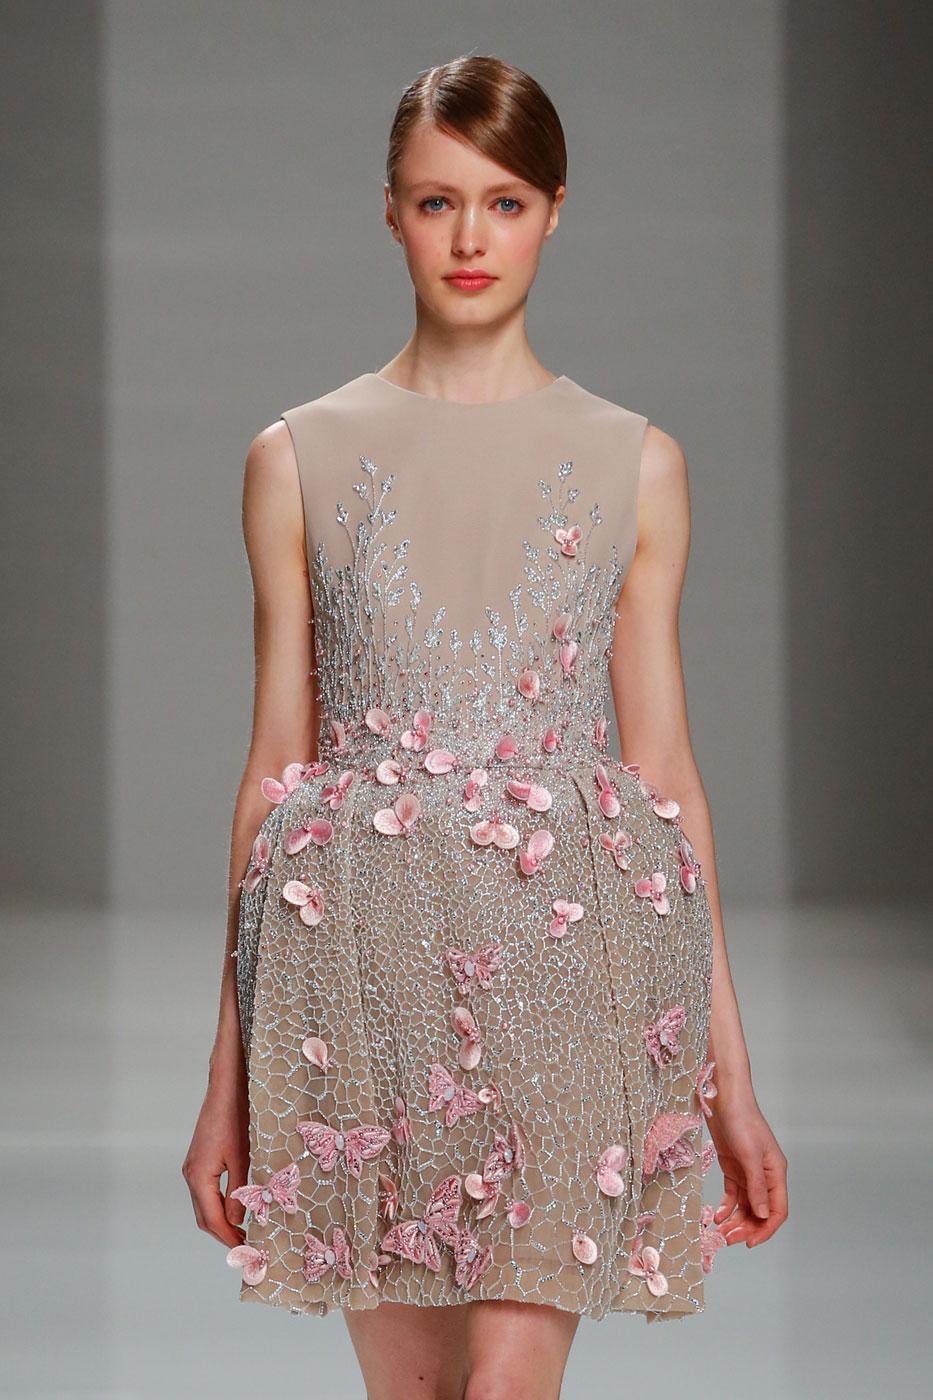 Georges-Hobeika-fashion-runway-show-haute-couture-paris-spring-2015-the-impression-50